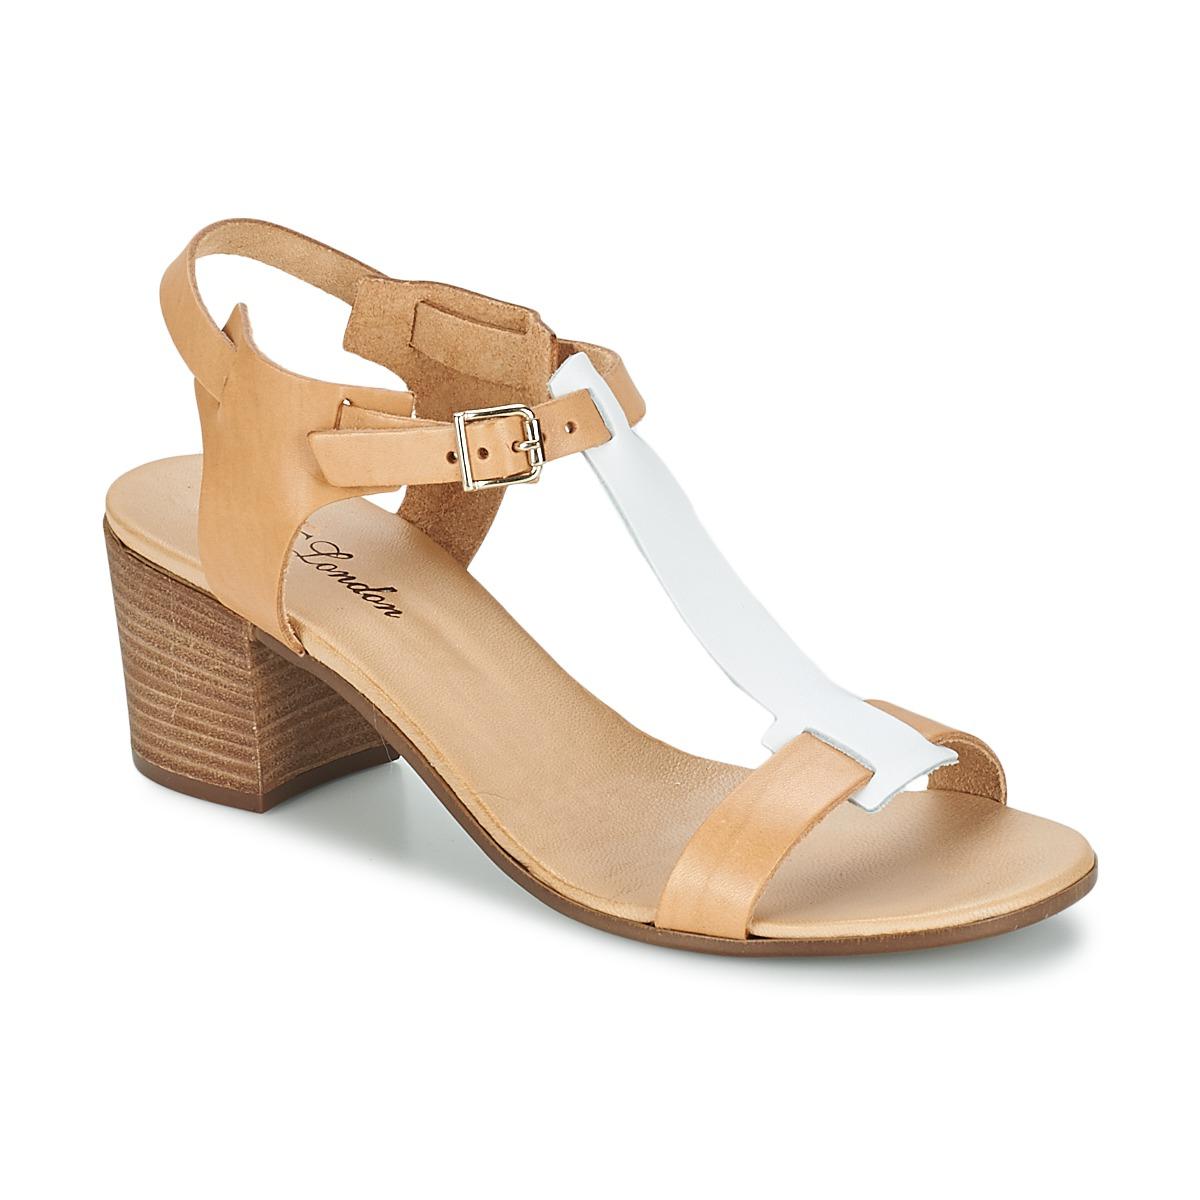 Sandals BT London GANTOMI CAMEL / White